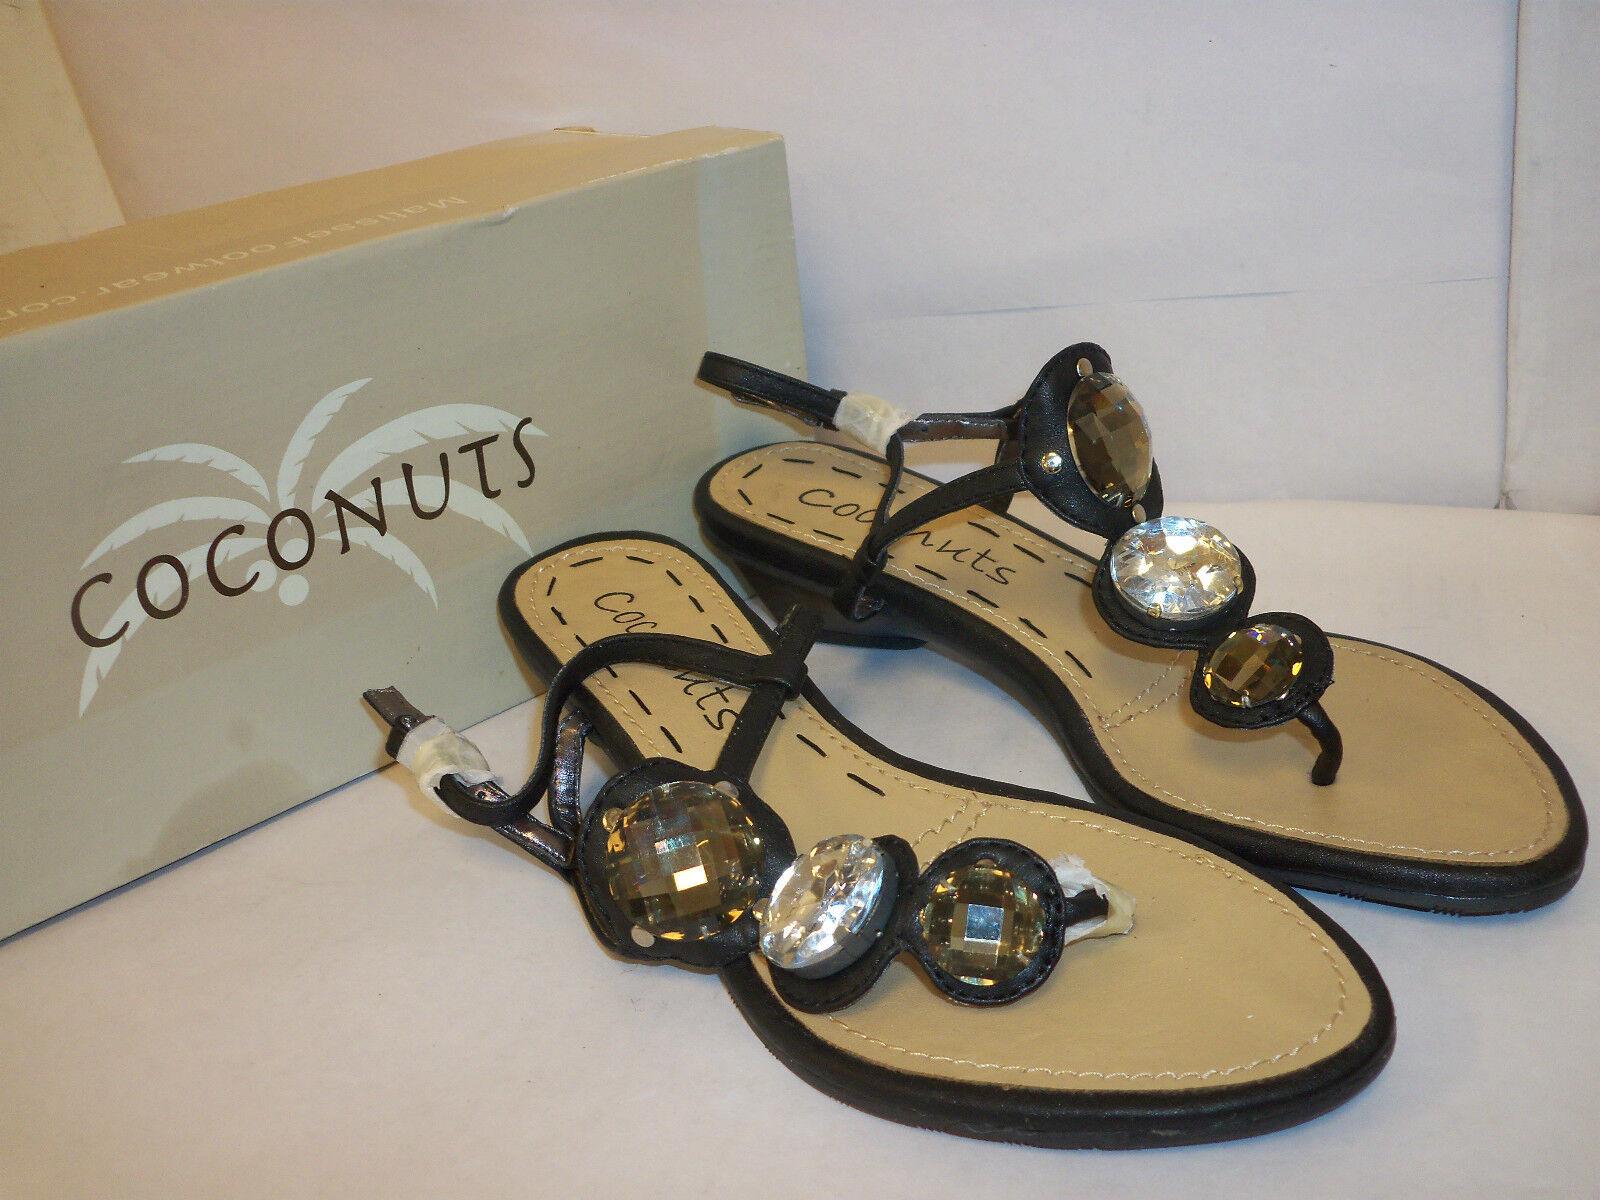 Coconuts nuevo para para para mujer Matisse Boardwalk Negro 6 M Charol Sandalias Zapatos  toma